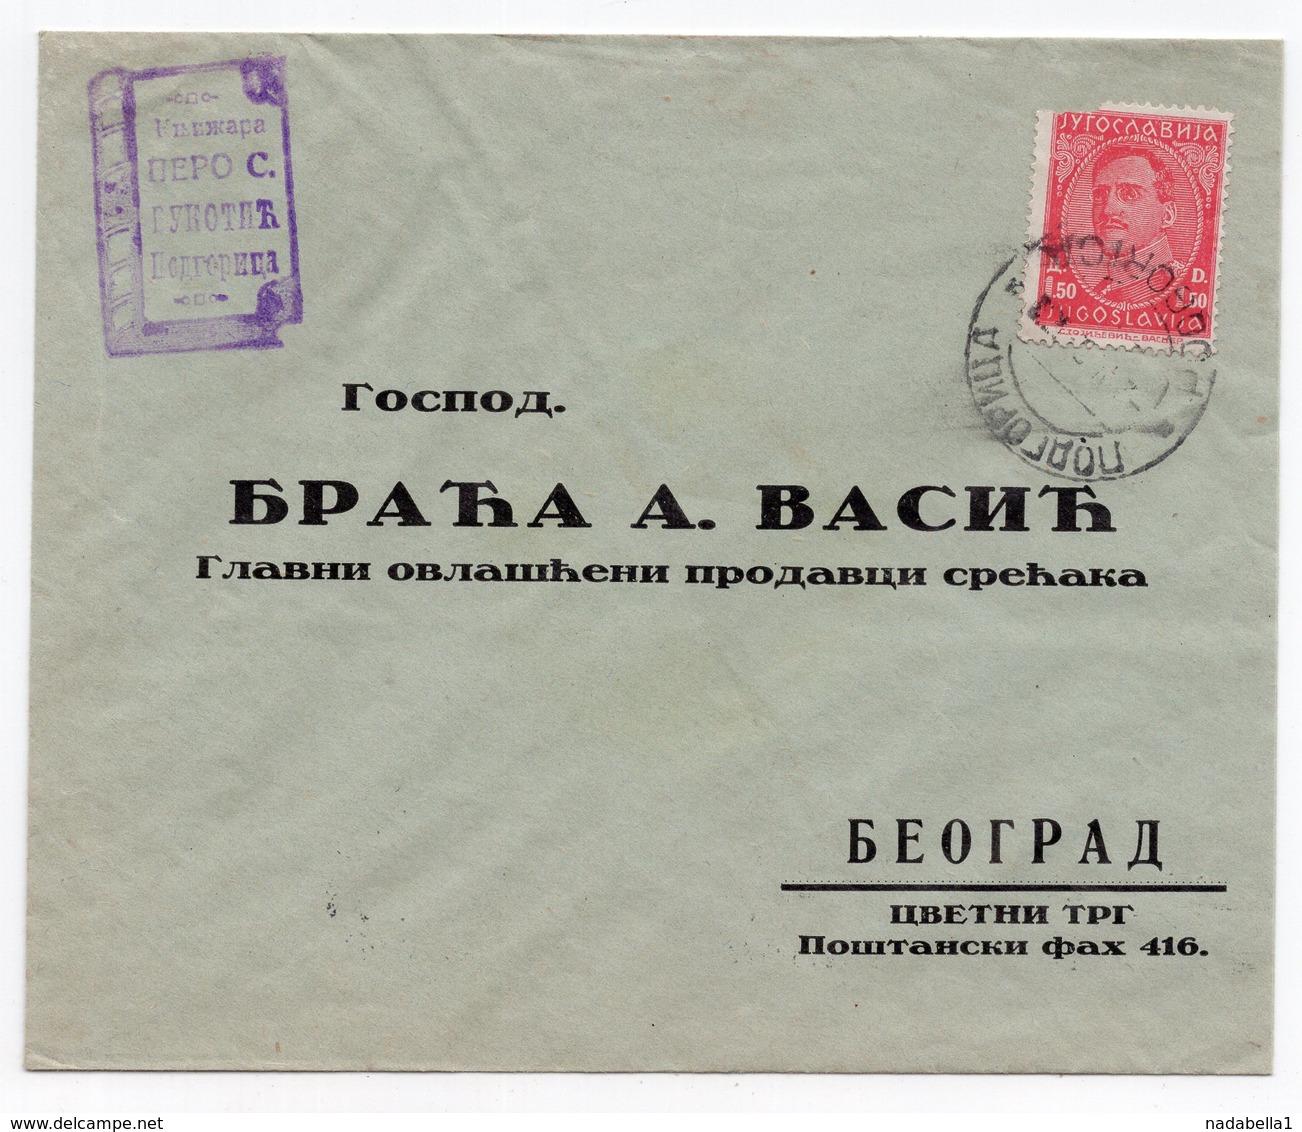 1933 YUGOSLAVIA, MONTENEGRO, PODGORICA, POSTER STAMP, STATIONERY SUPPLIERS, PERO VUKOTIC - 1931-1941 Kingdom Of Yugoslavia